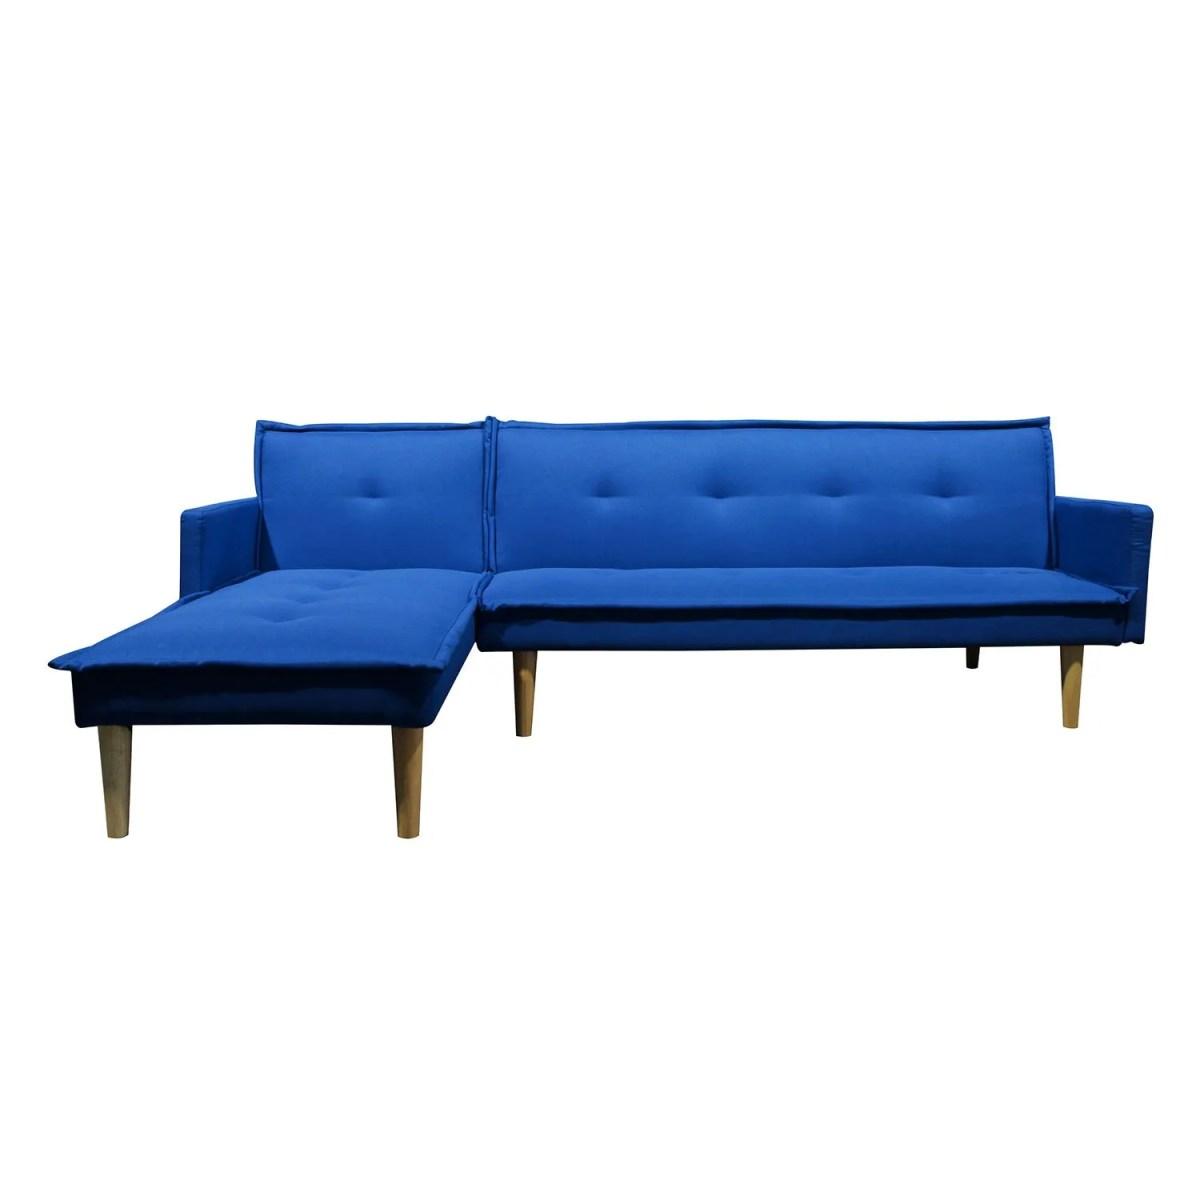 sala esquinada sofá cama independencia azul 3